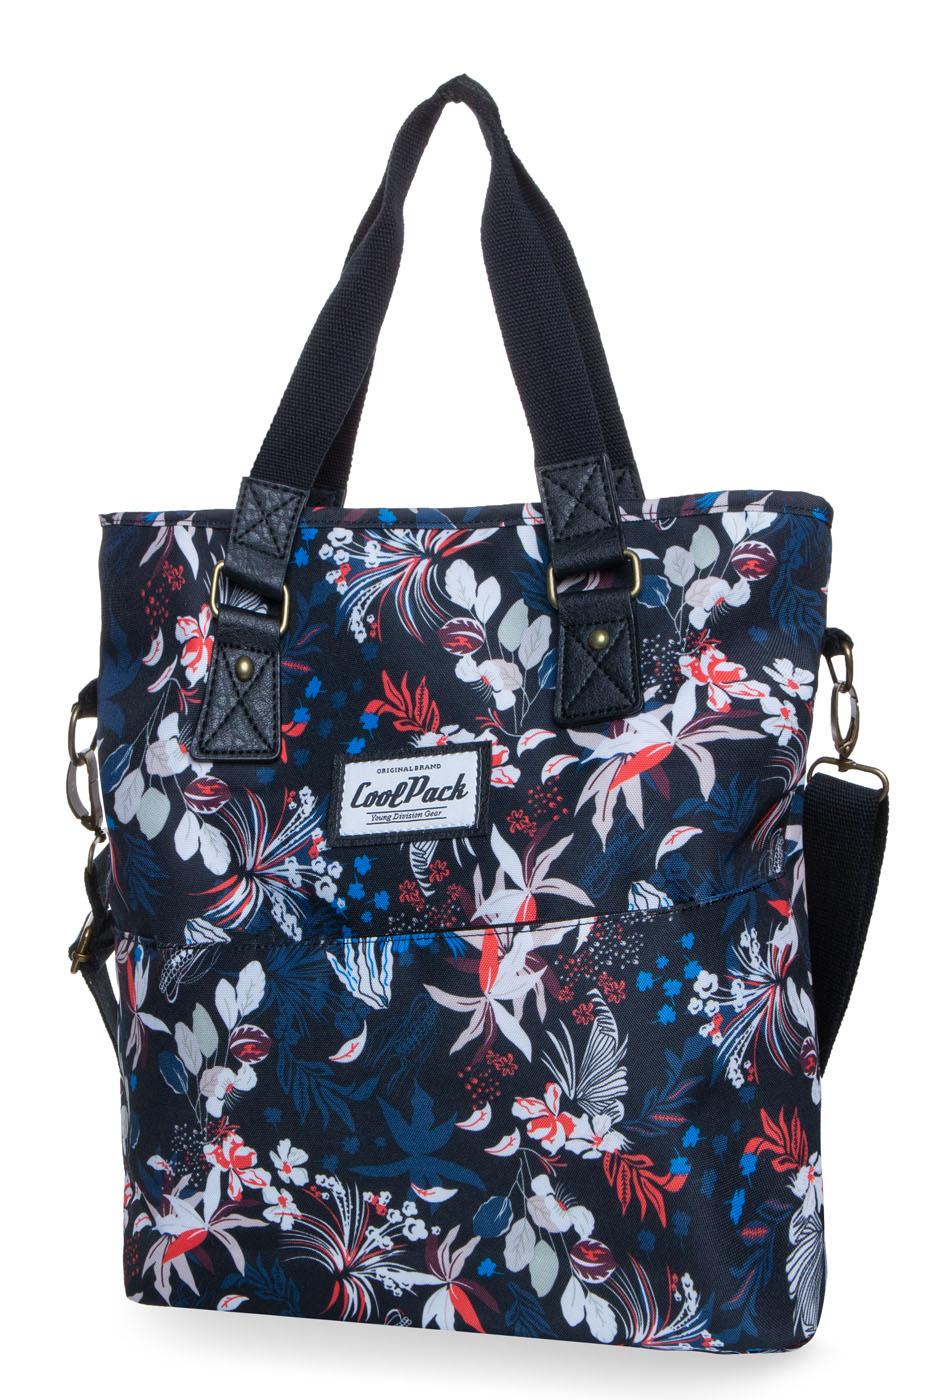 Coolpack - amber - shoulder bag - ocean garden